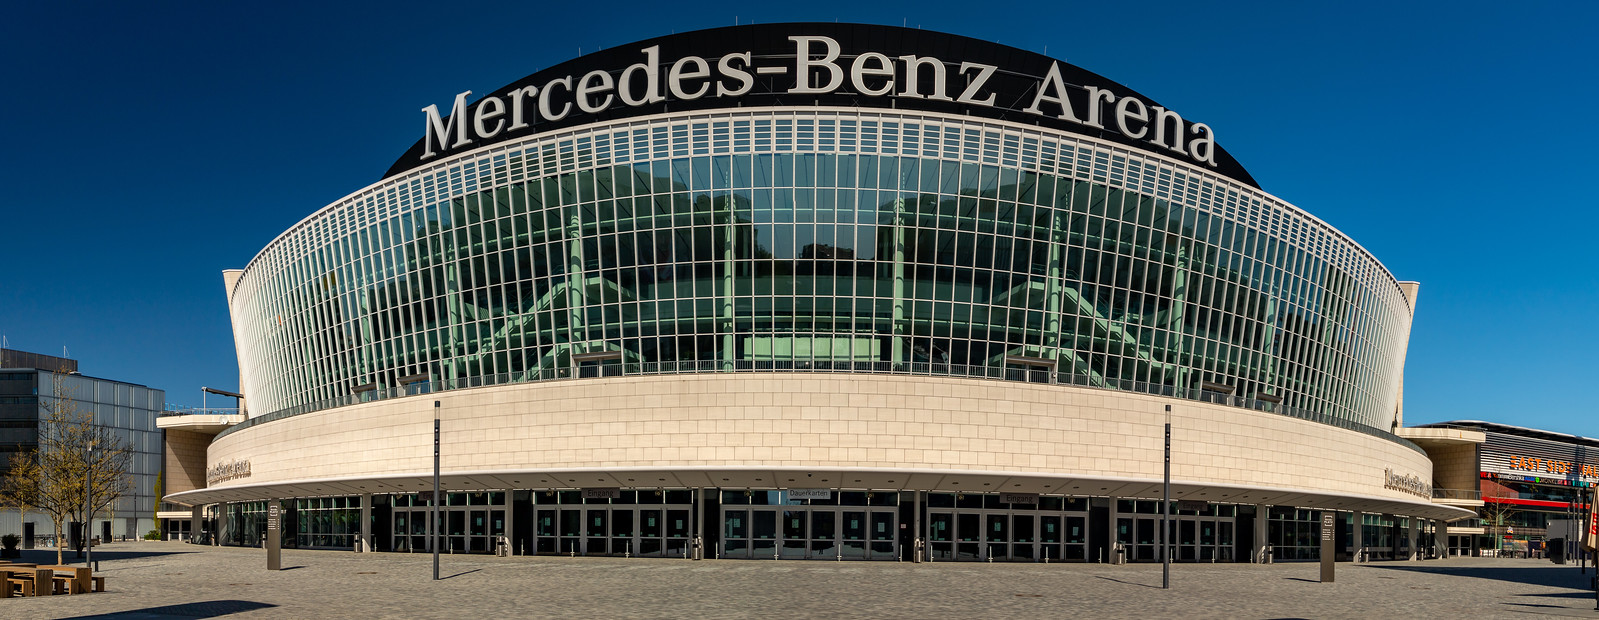 Die Mercedes-Benz-Arena